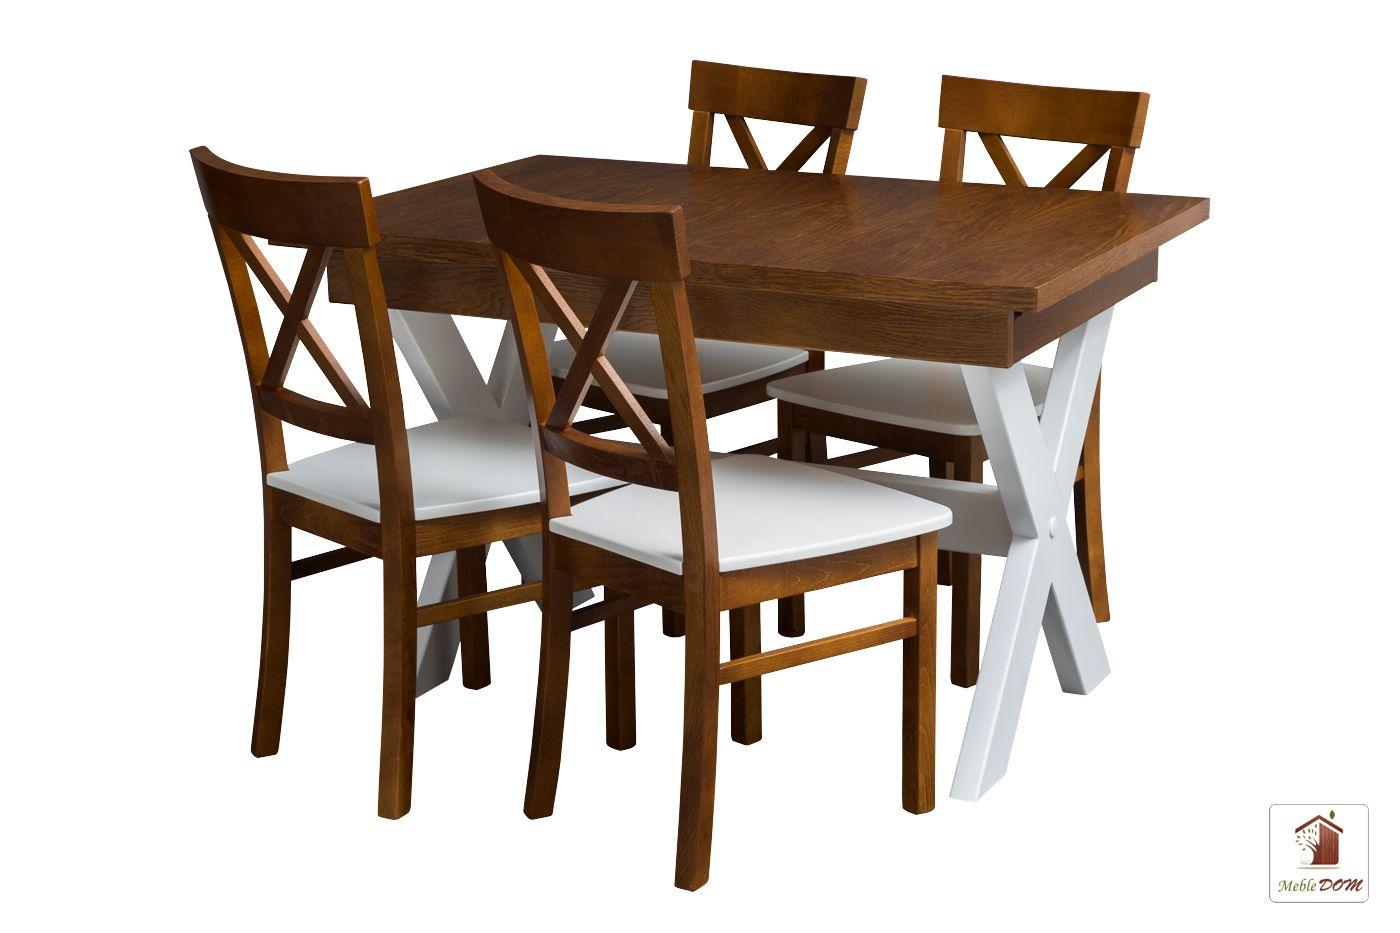 Prostokątny stół rozkładany Malmo 120 lub 140 z krzesłami Nord